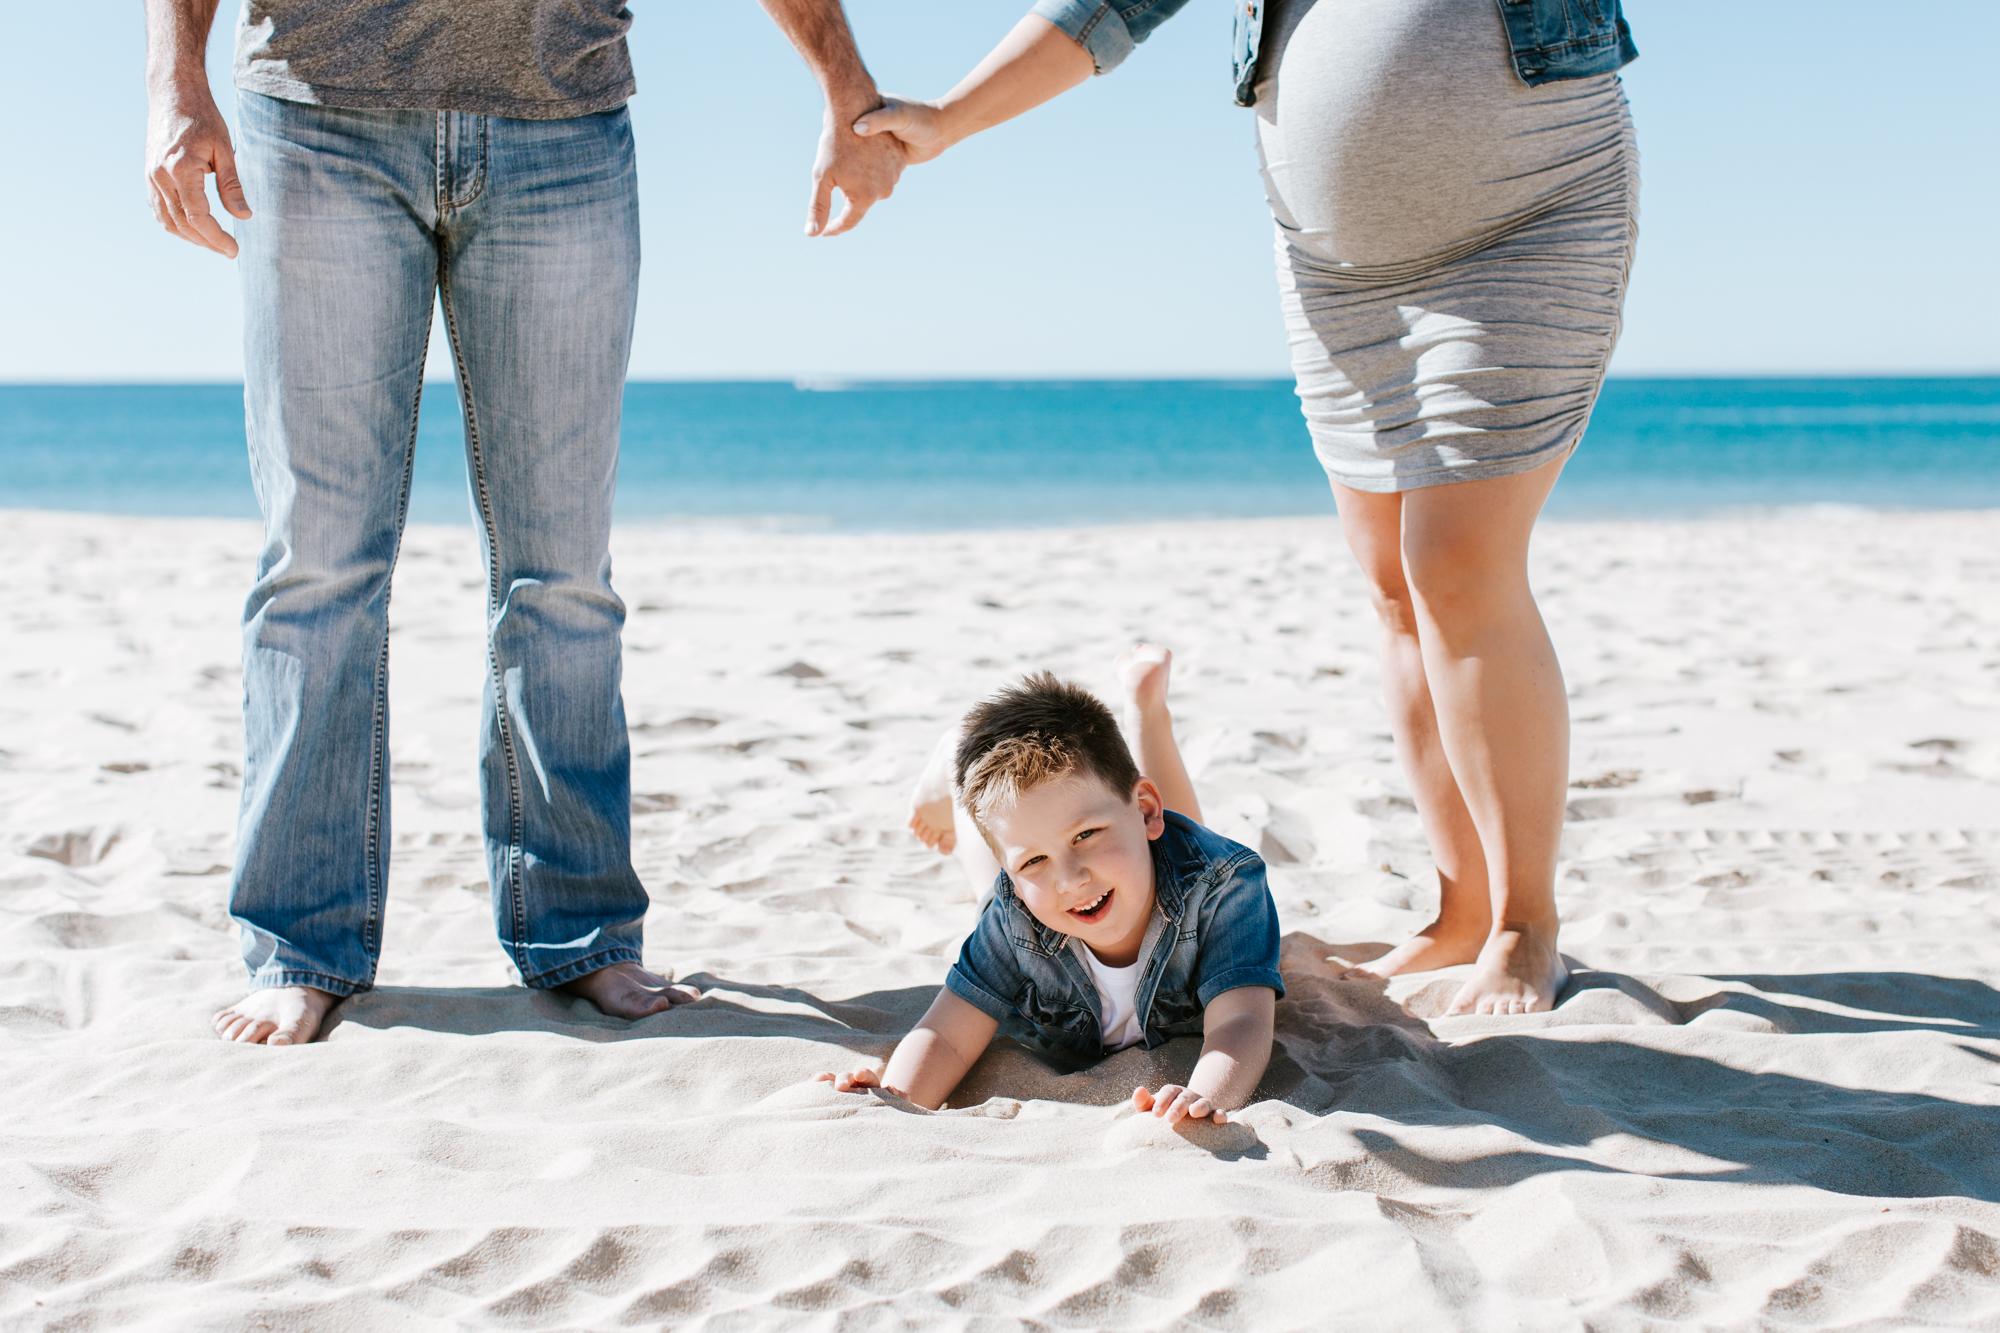 Brisbane maternity photographer kym renay.rach.mat 022.jpg